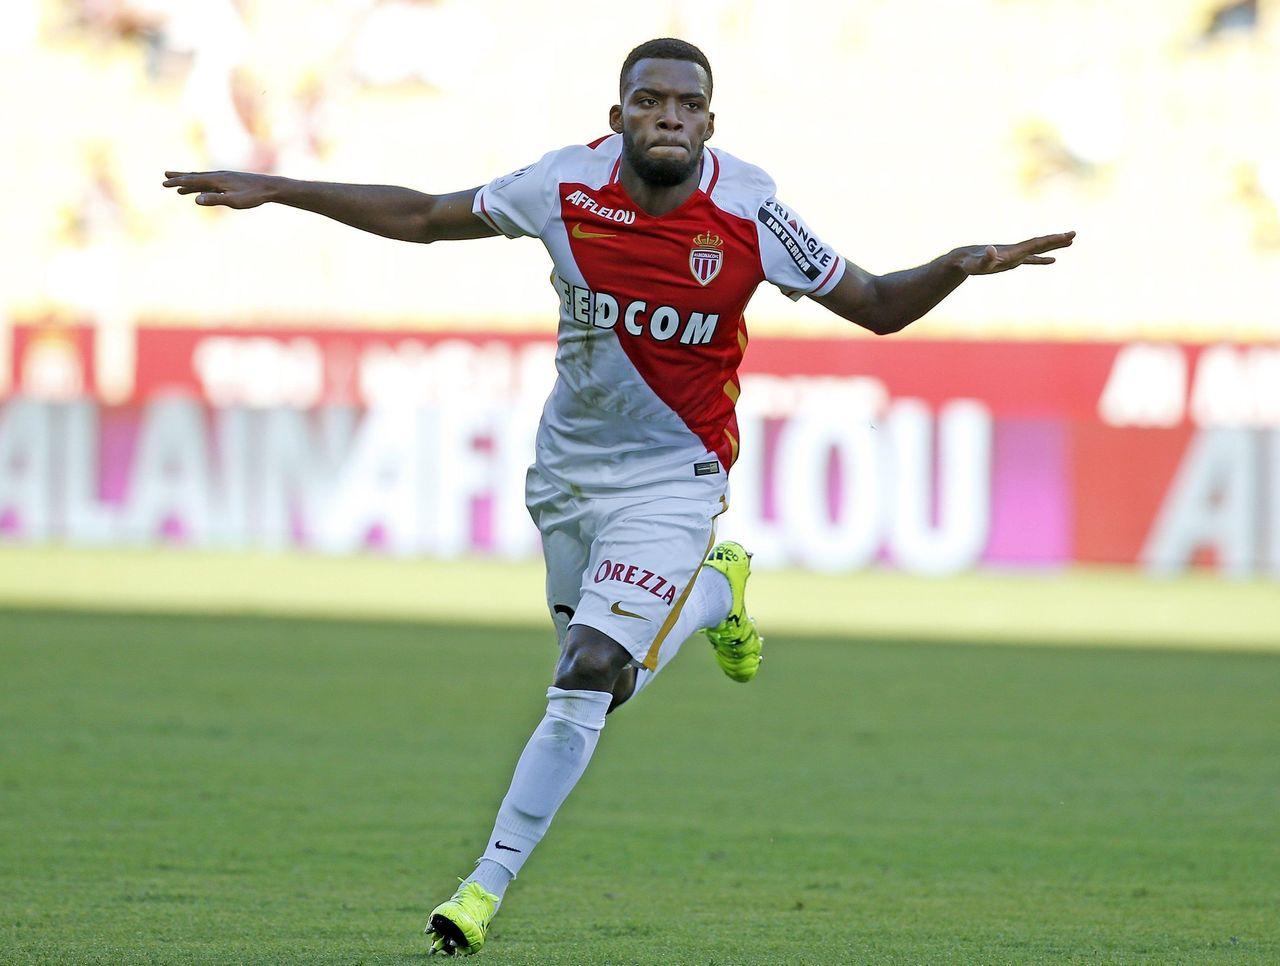 Статистика и прогноз на матч Монако